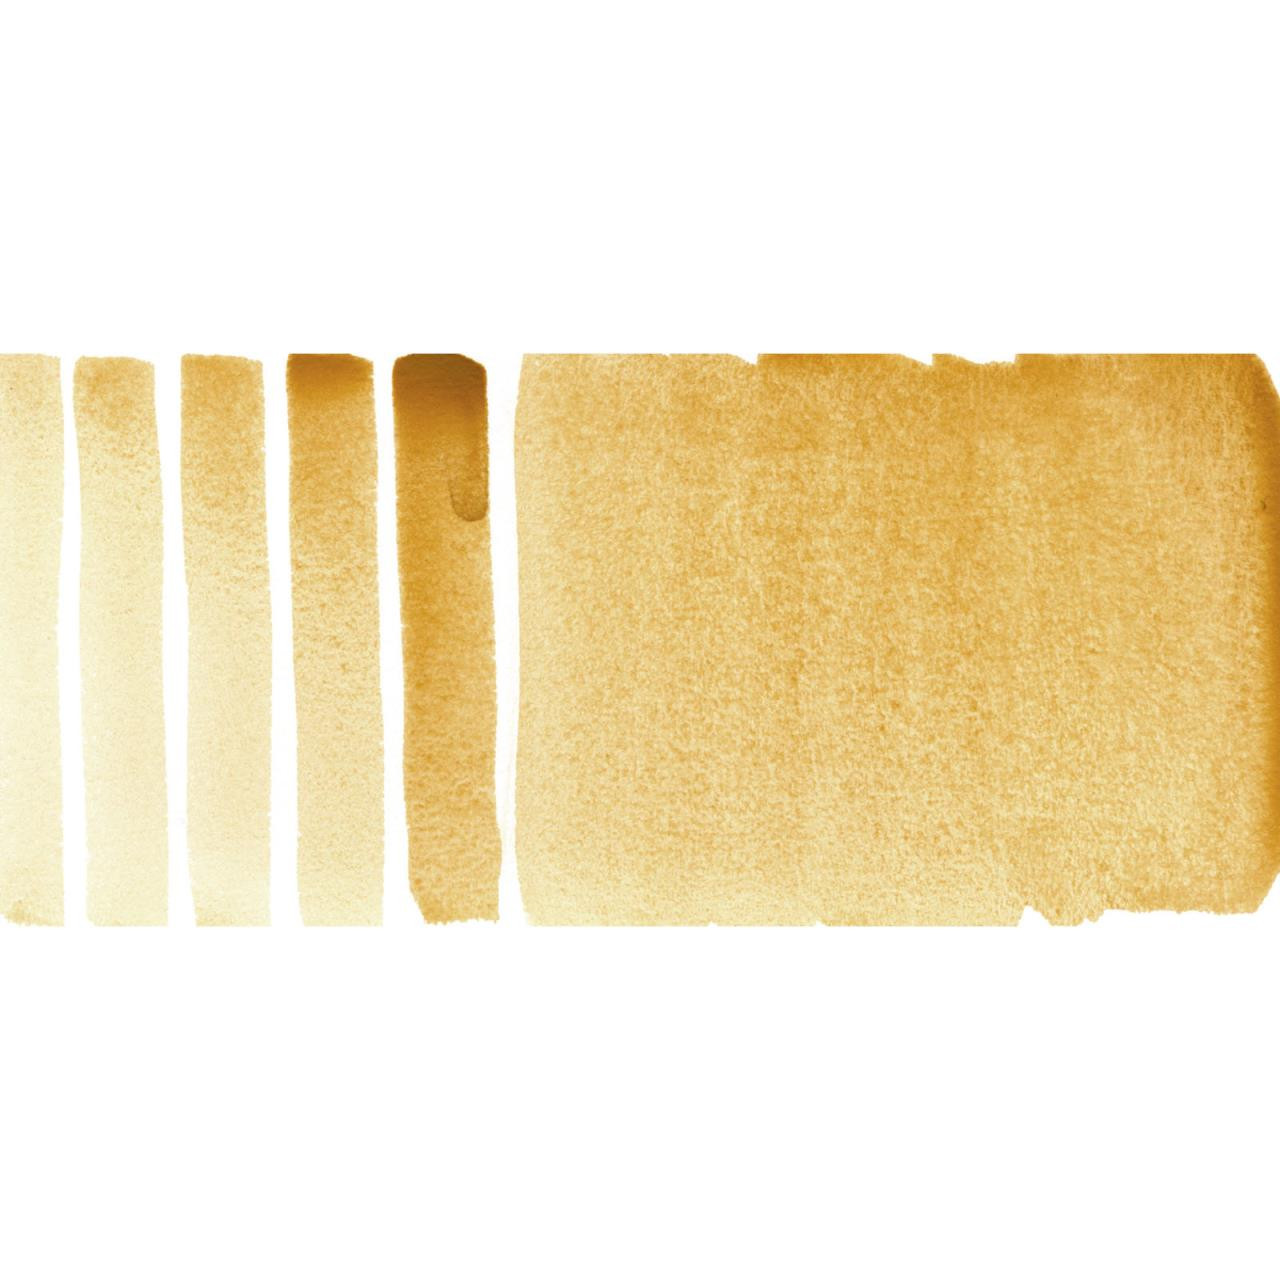 Verona Gold Ochre, DANIEL SMITH Extra Fine Watercolors 15ml Tubes -